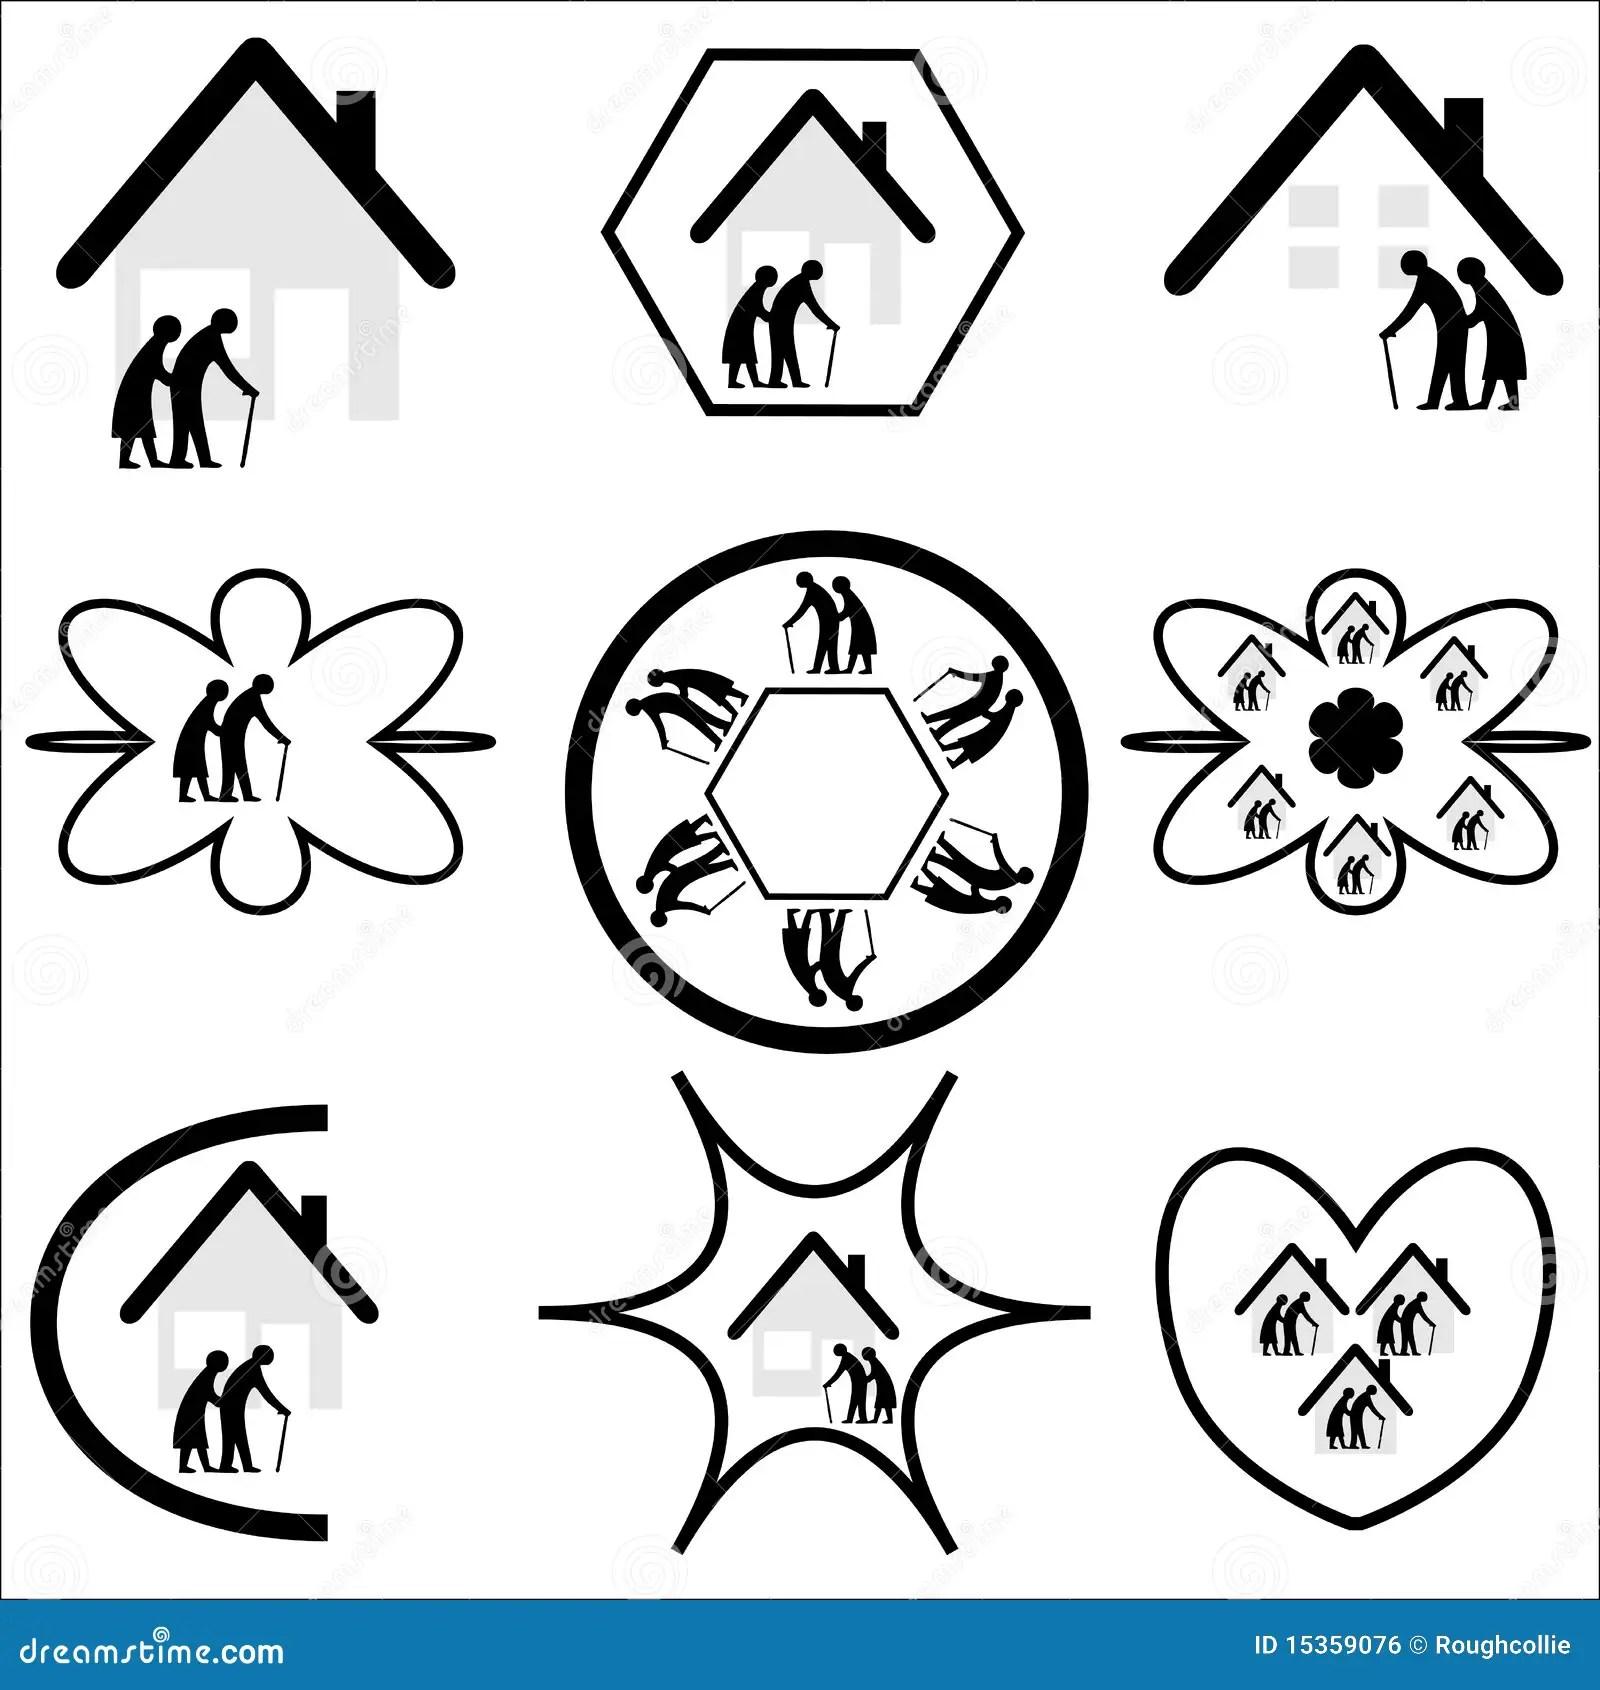 Seniors Elderly Housing Logo Set Royalty Free Stock